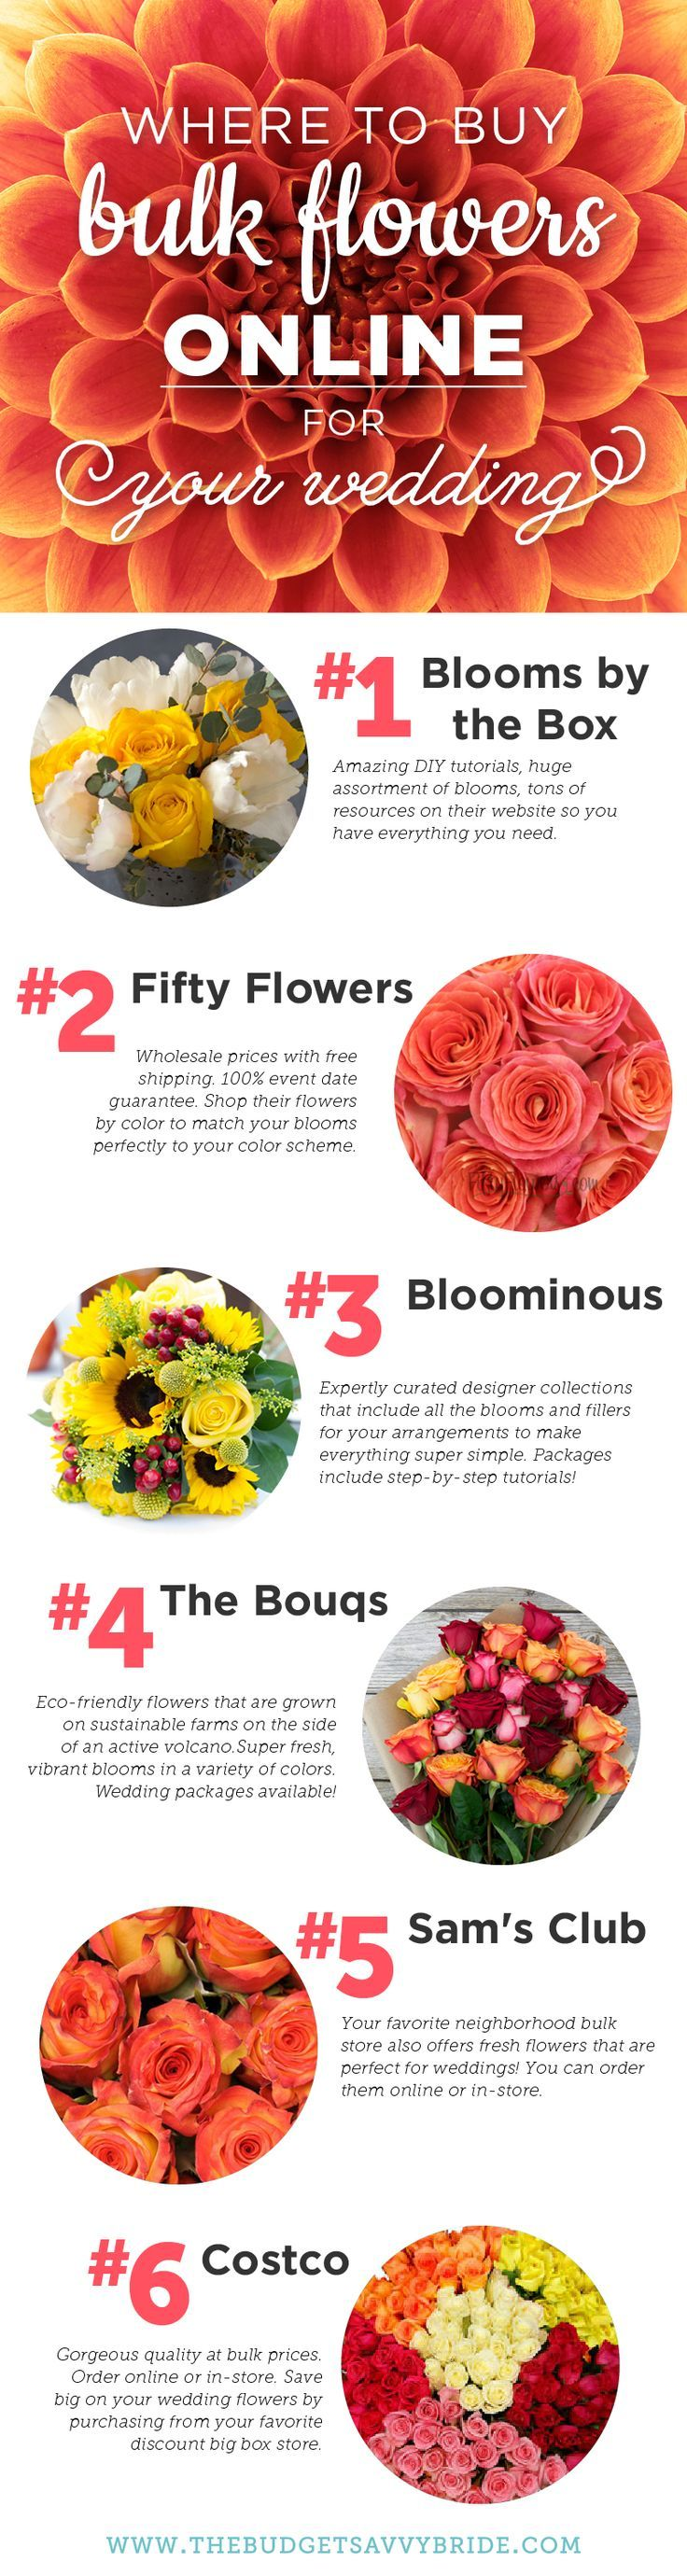 Where to buy bulk flowers online for your wedding izmirmasajfo